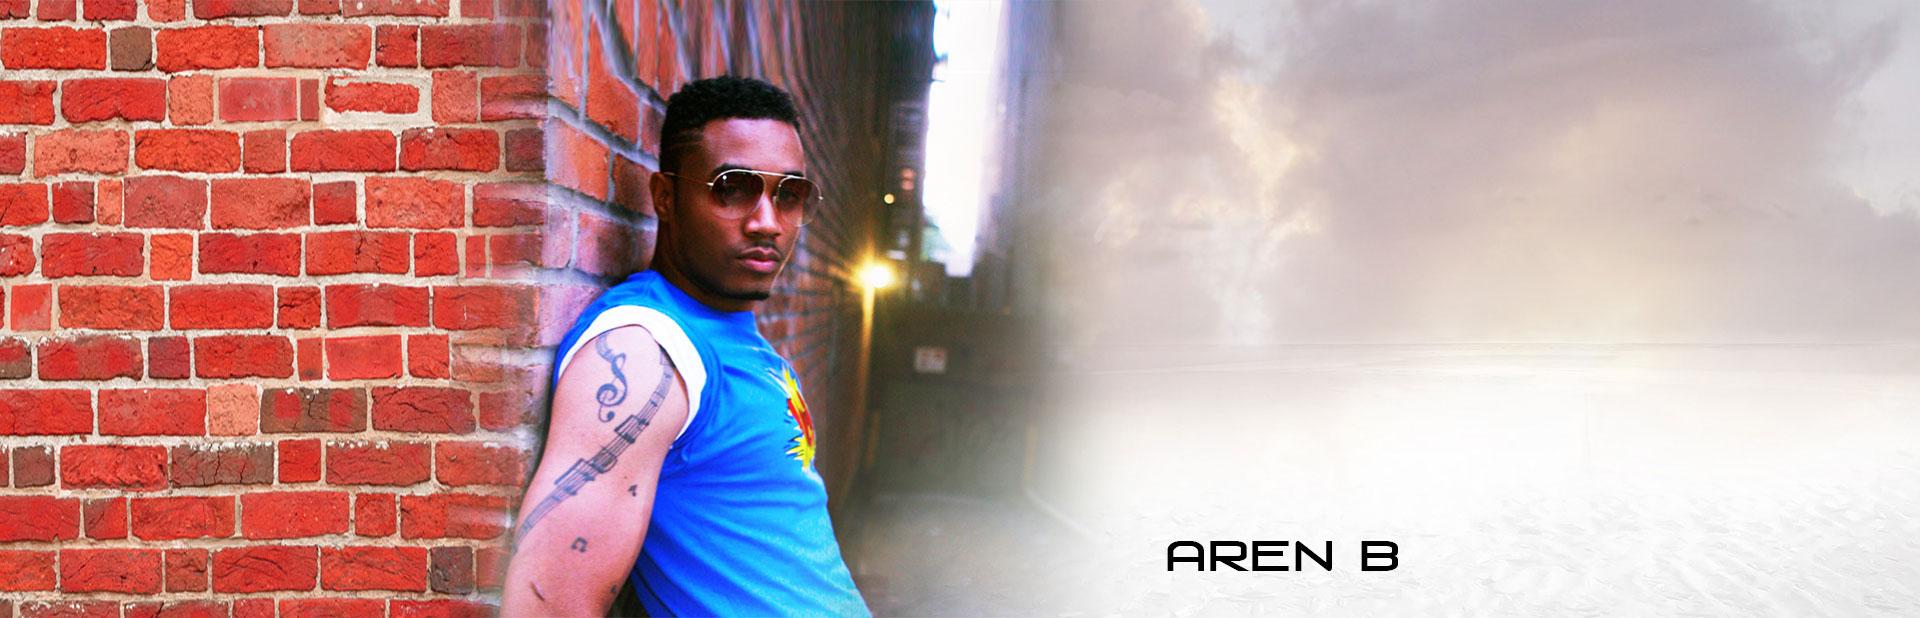 Aren B